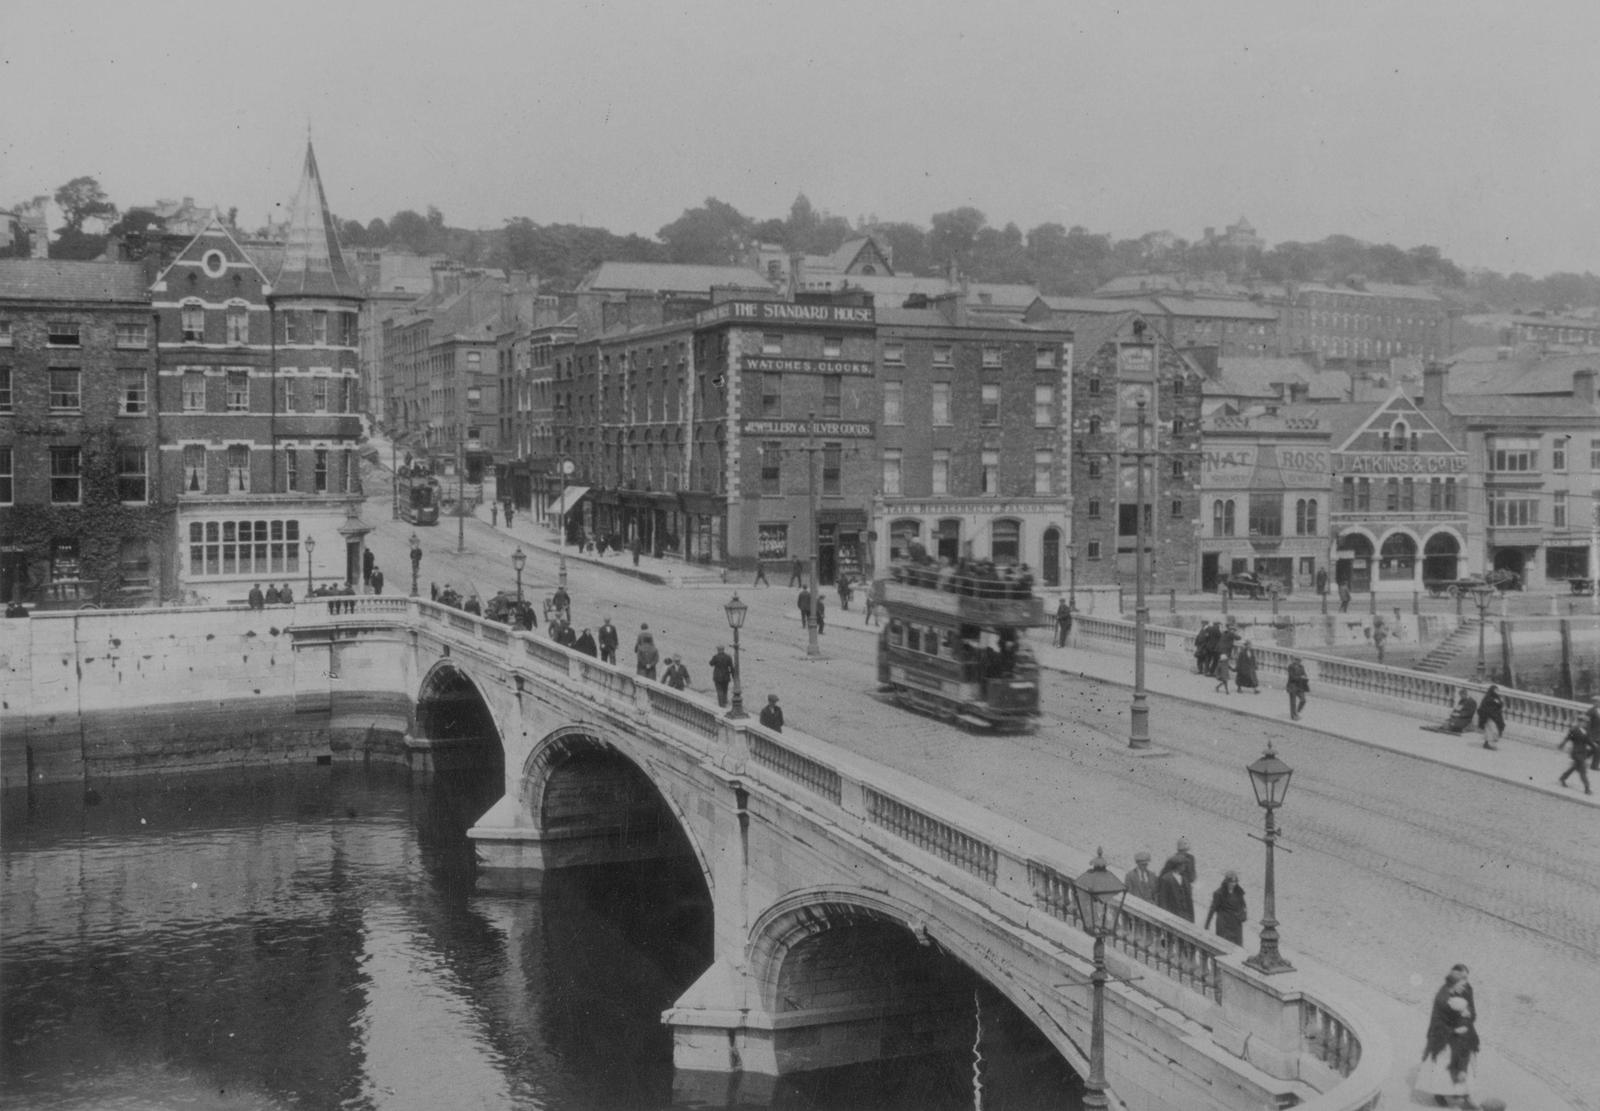 Image - A tram crosses the bridge in Cork City, Ireland, circa 1930.